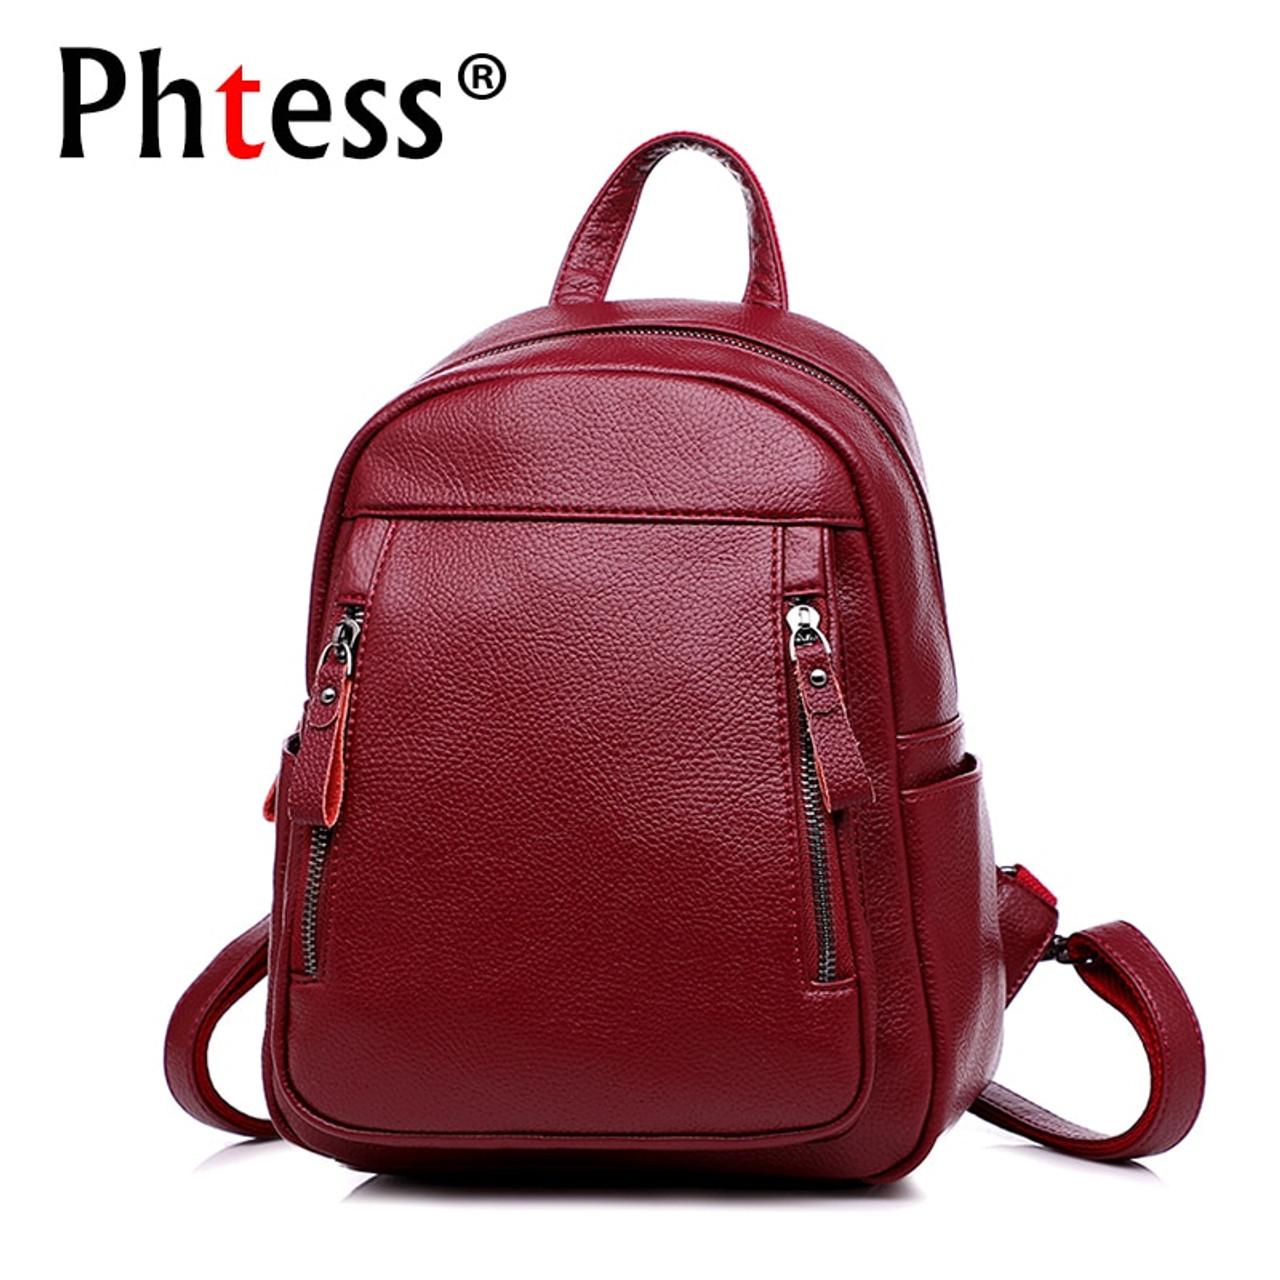 3658d8b8b87 2019 women leather backpacks vintage female shoulder bags sac a dos ...